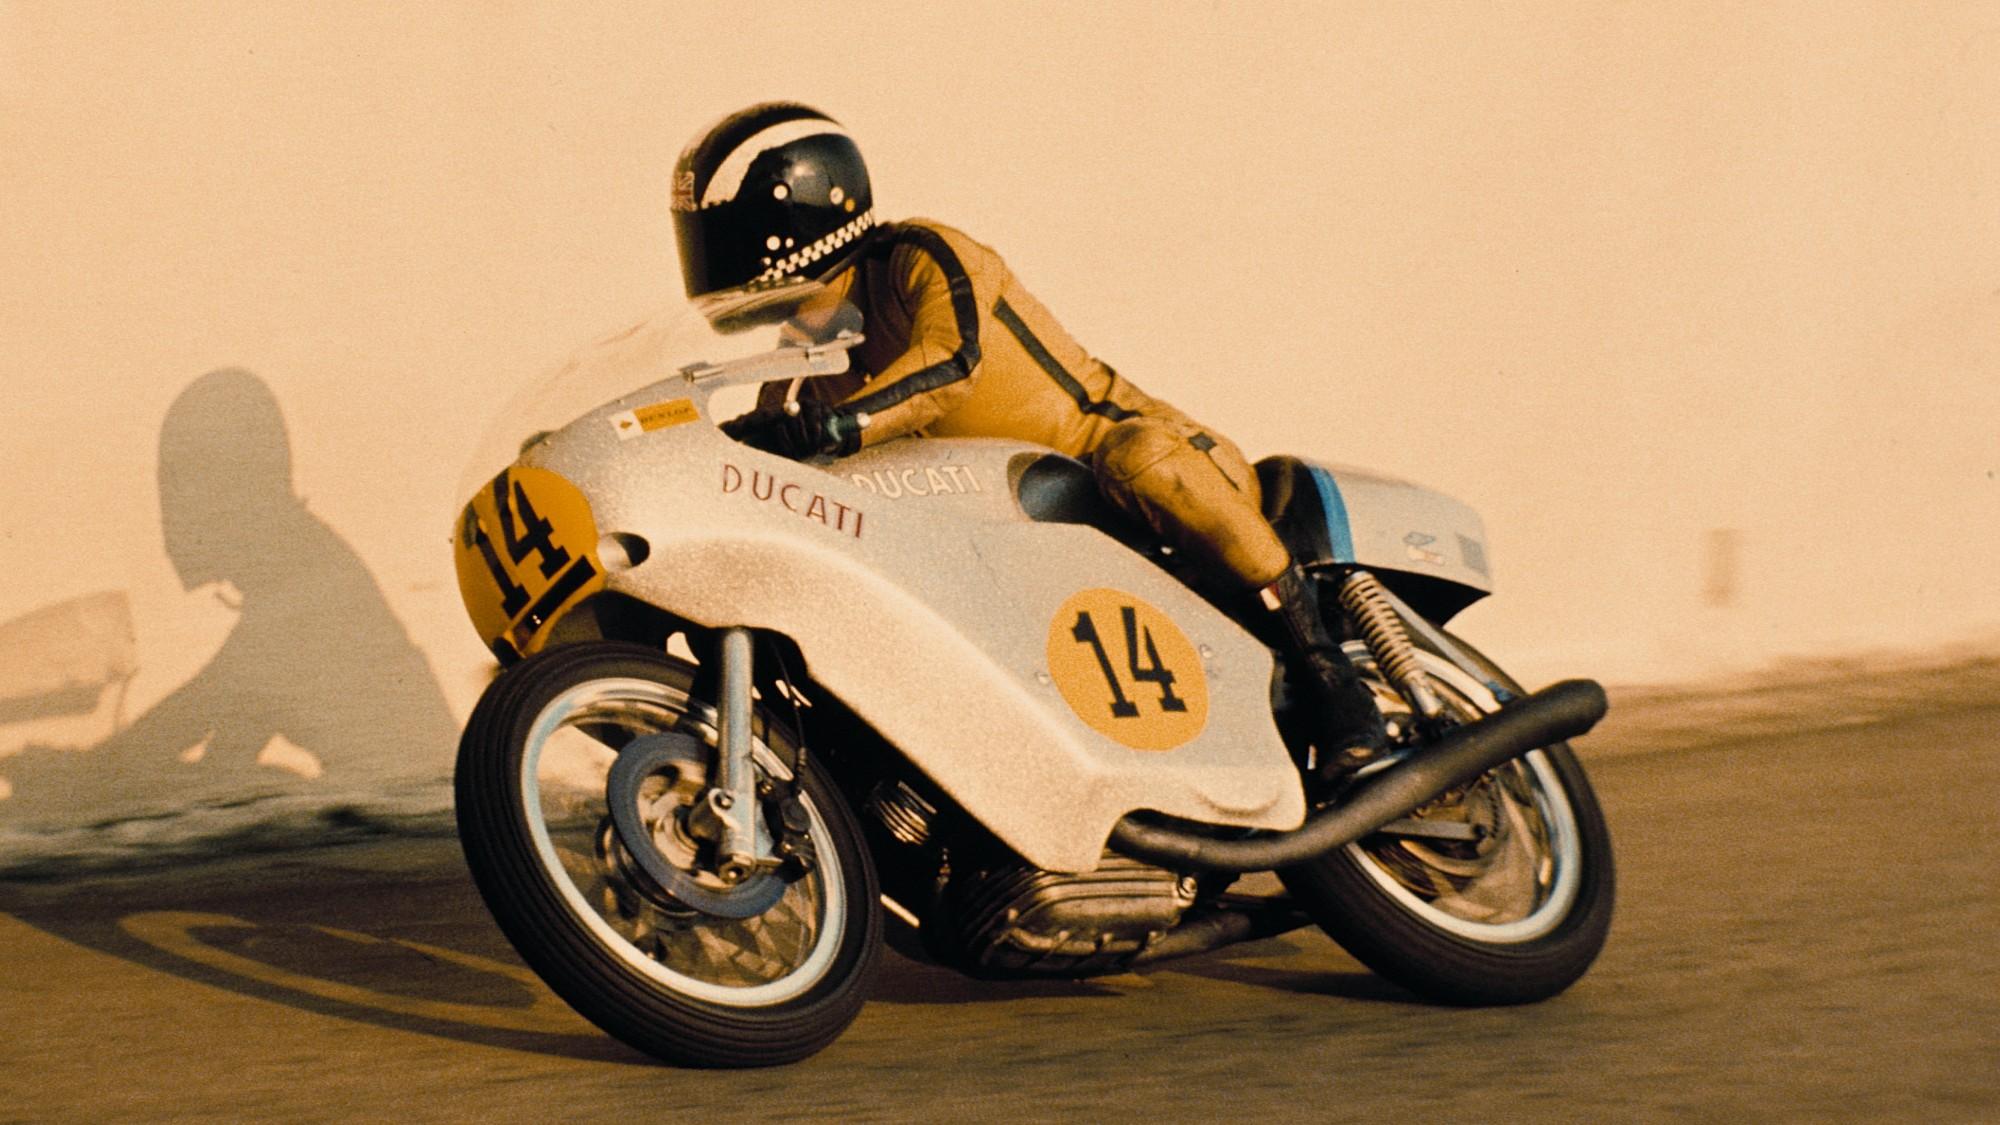 Phil Read, 1971 Ducati